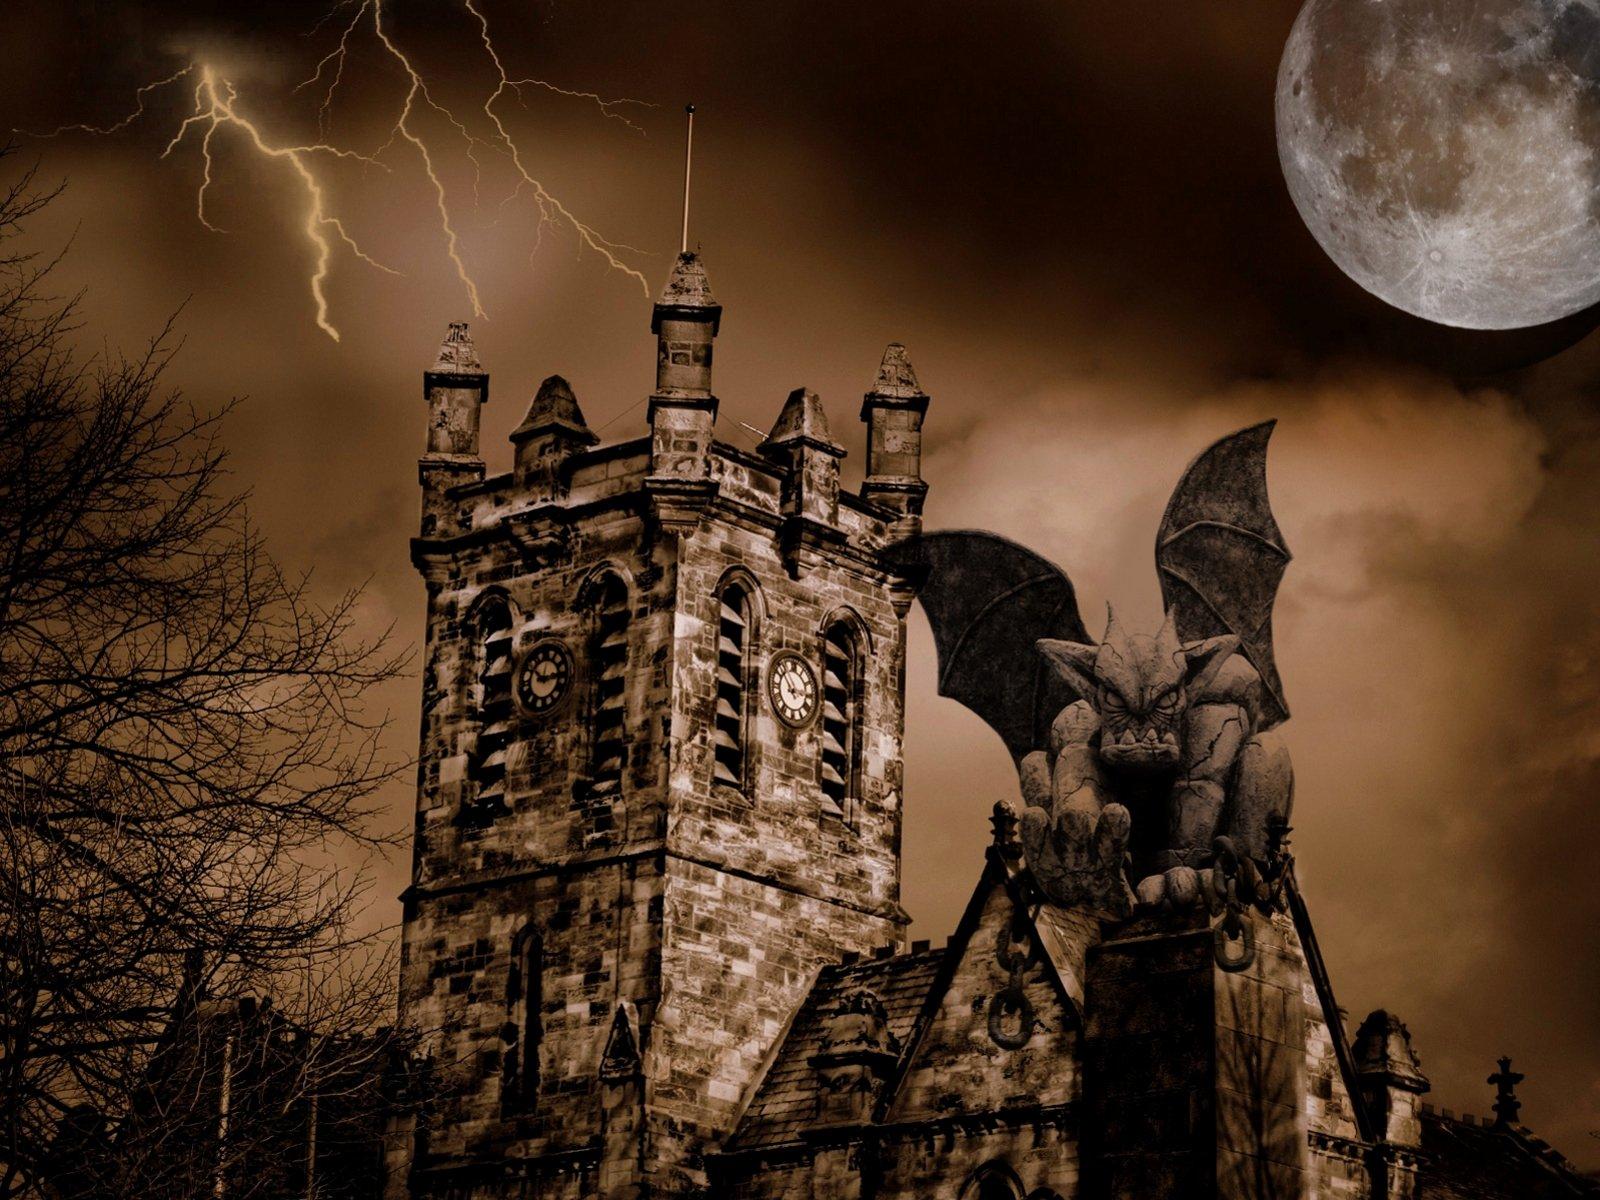 Free Halloween Powerpoint Templates Inspirational Free Download Halloween Powerpoint Backgrounds Ppt Garden